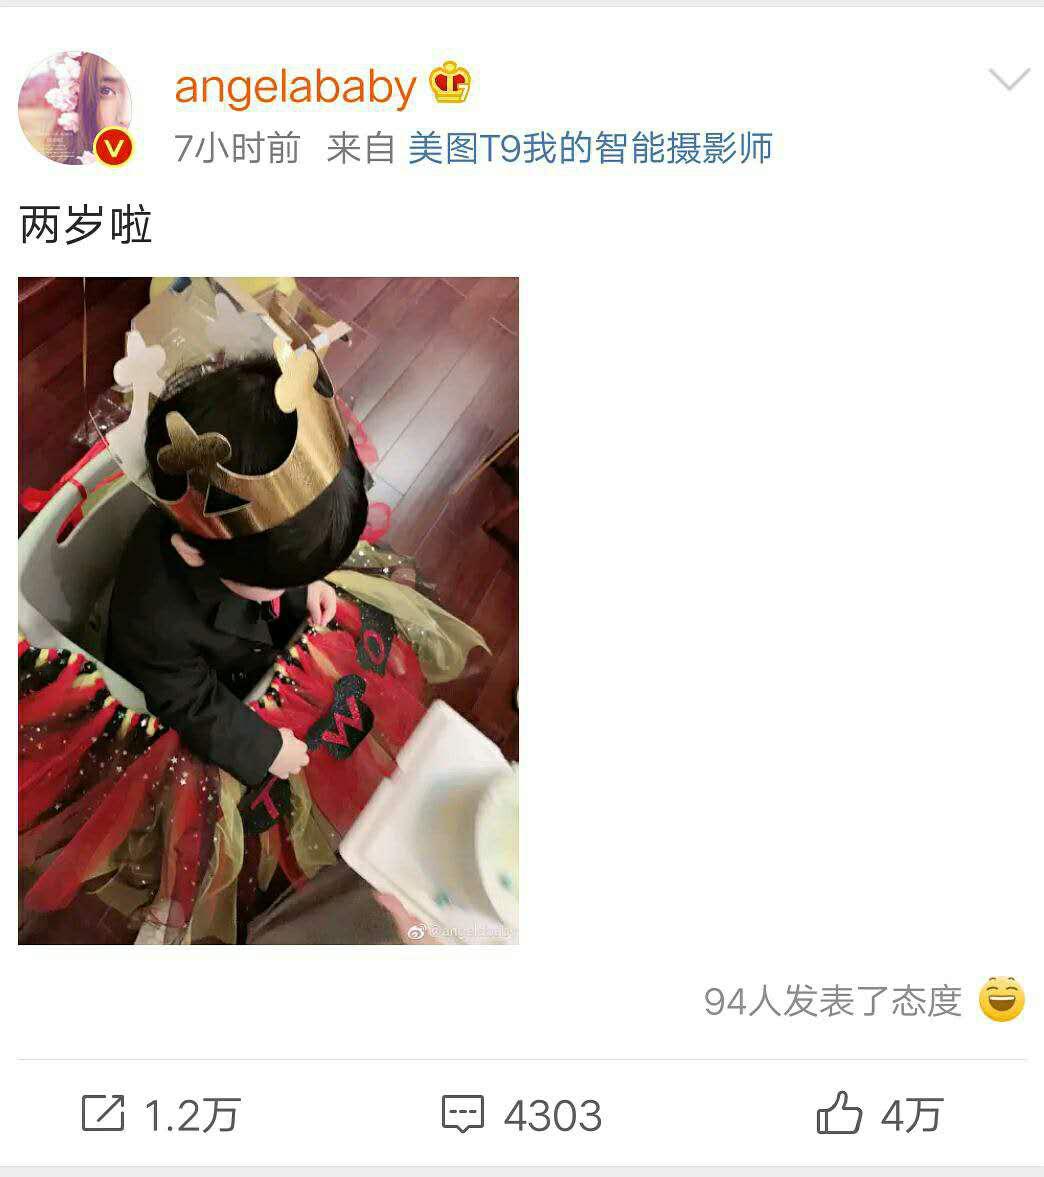 angelababy 与 xiaoming huang 为儿子 small sponge 庆生 离婚传闻还有谁敢说?